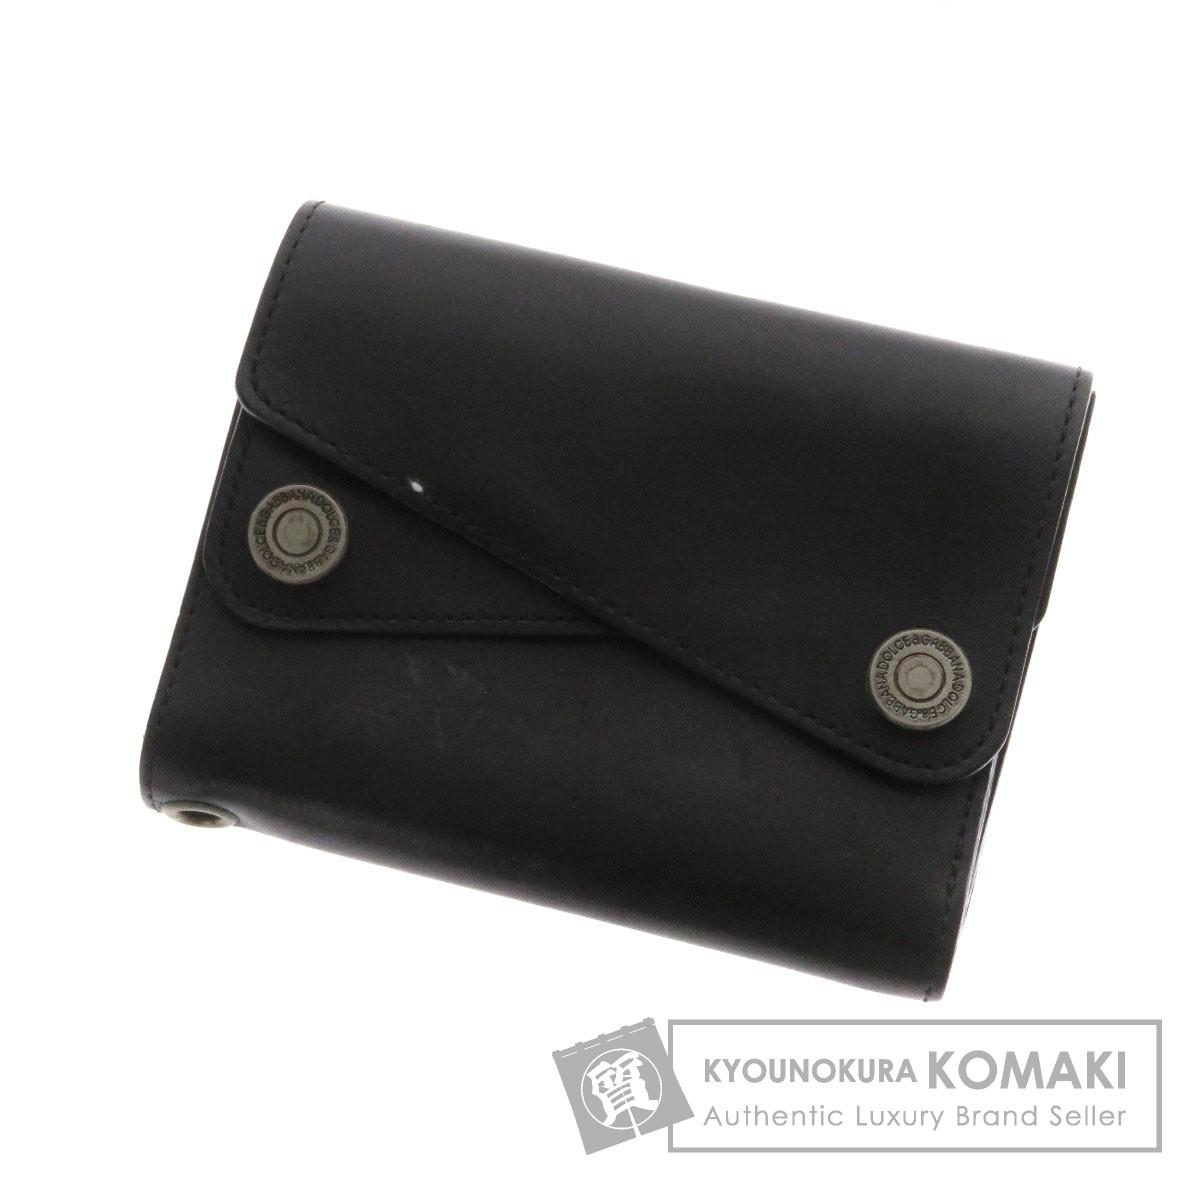 6181609189cd D&G コンパクト 二つ折り財布(小銭入れあり) レザー メンズ 【中古】【ディーアンドジー】 熱い販売のための使用可能